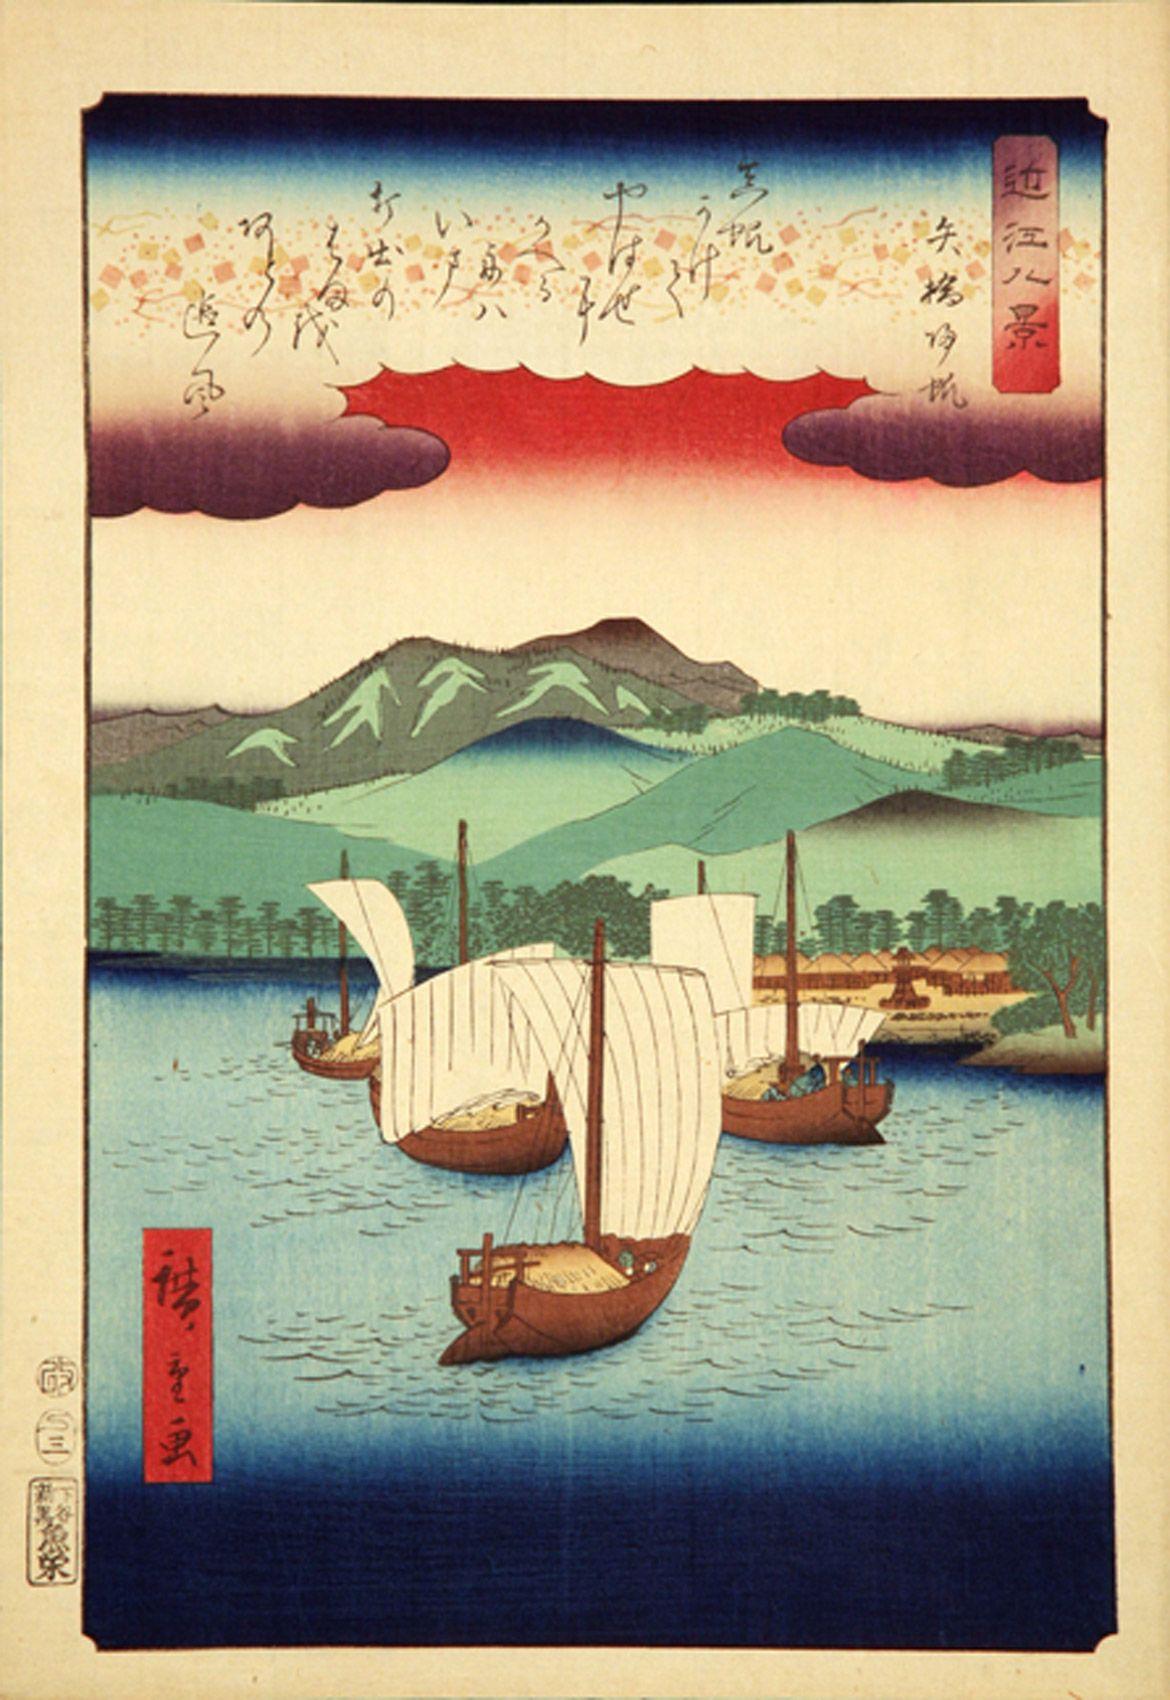 UTAGAWA HIROSHIGE Returning Sails at Yabase; Yabase no kihan